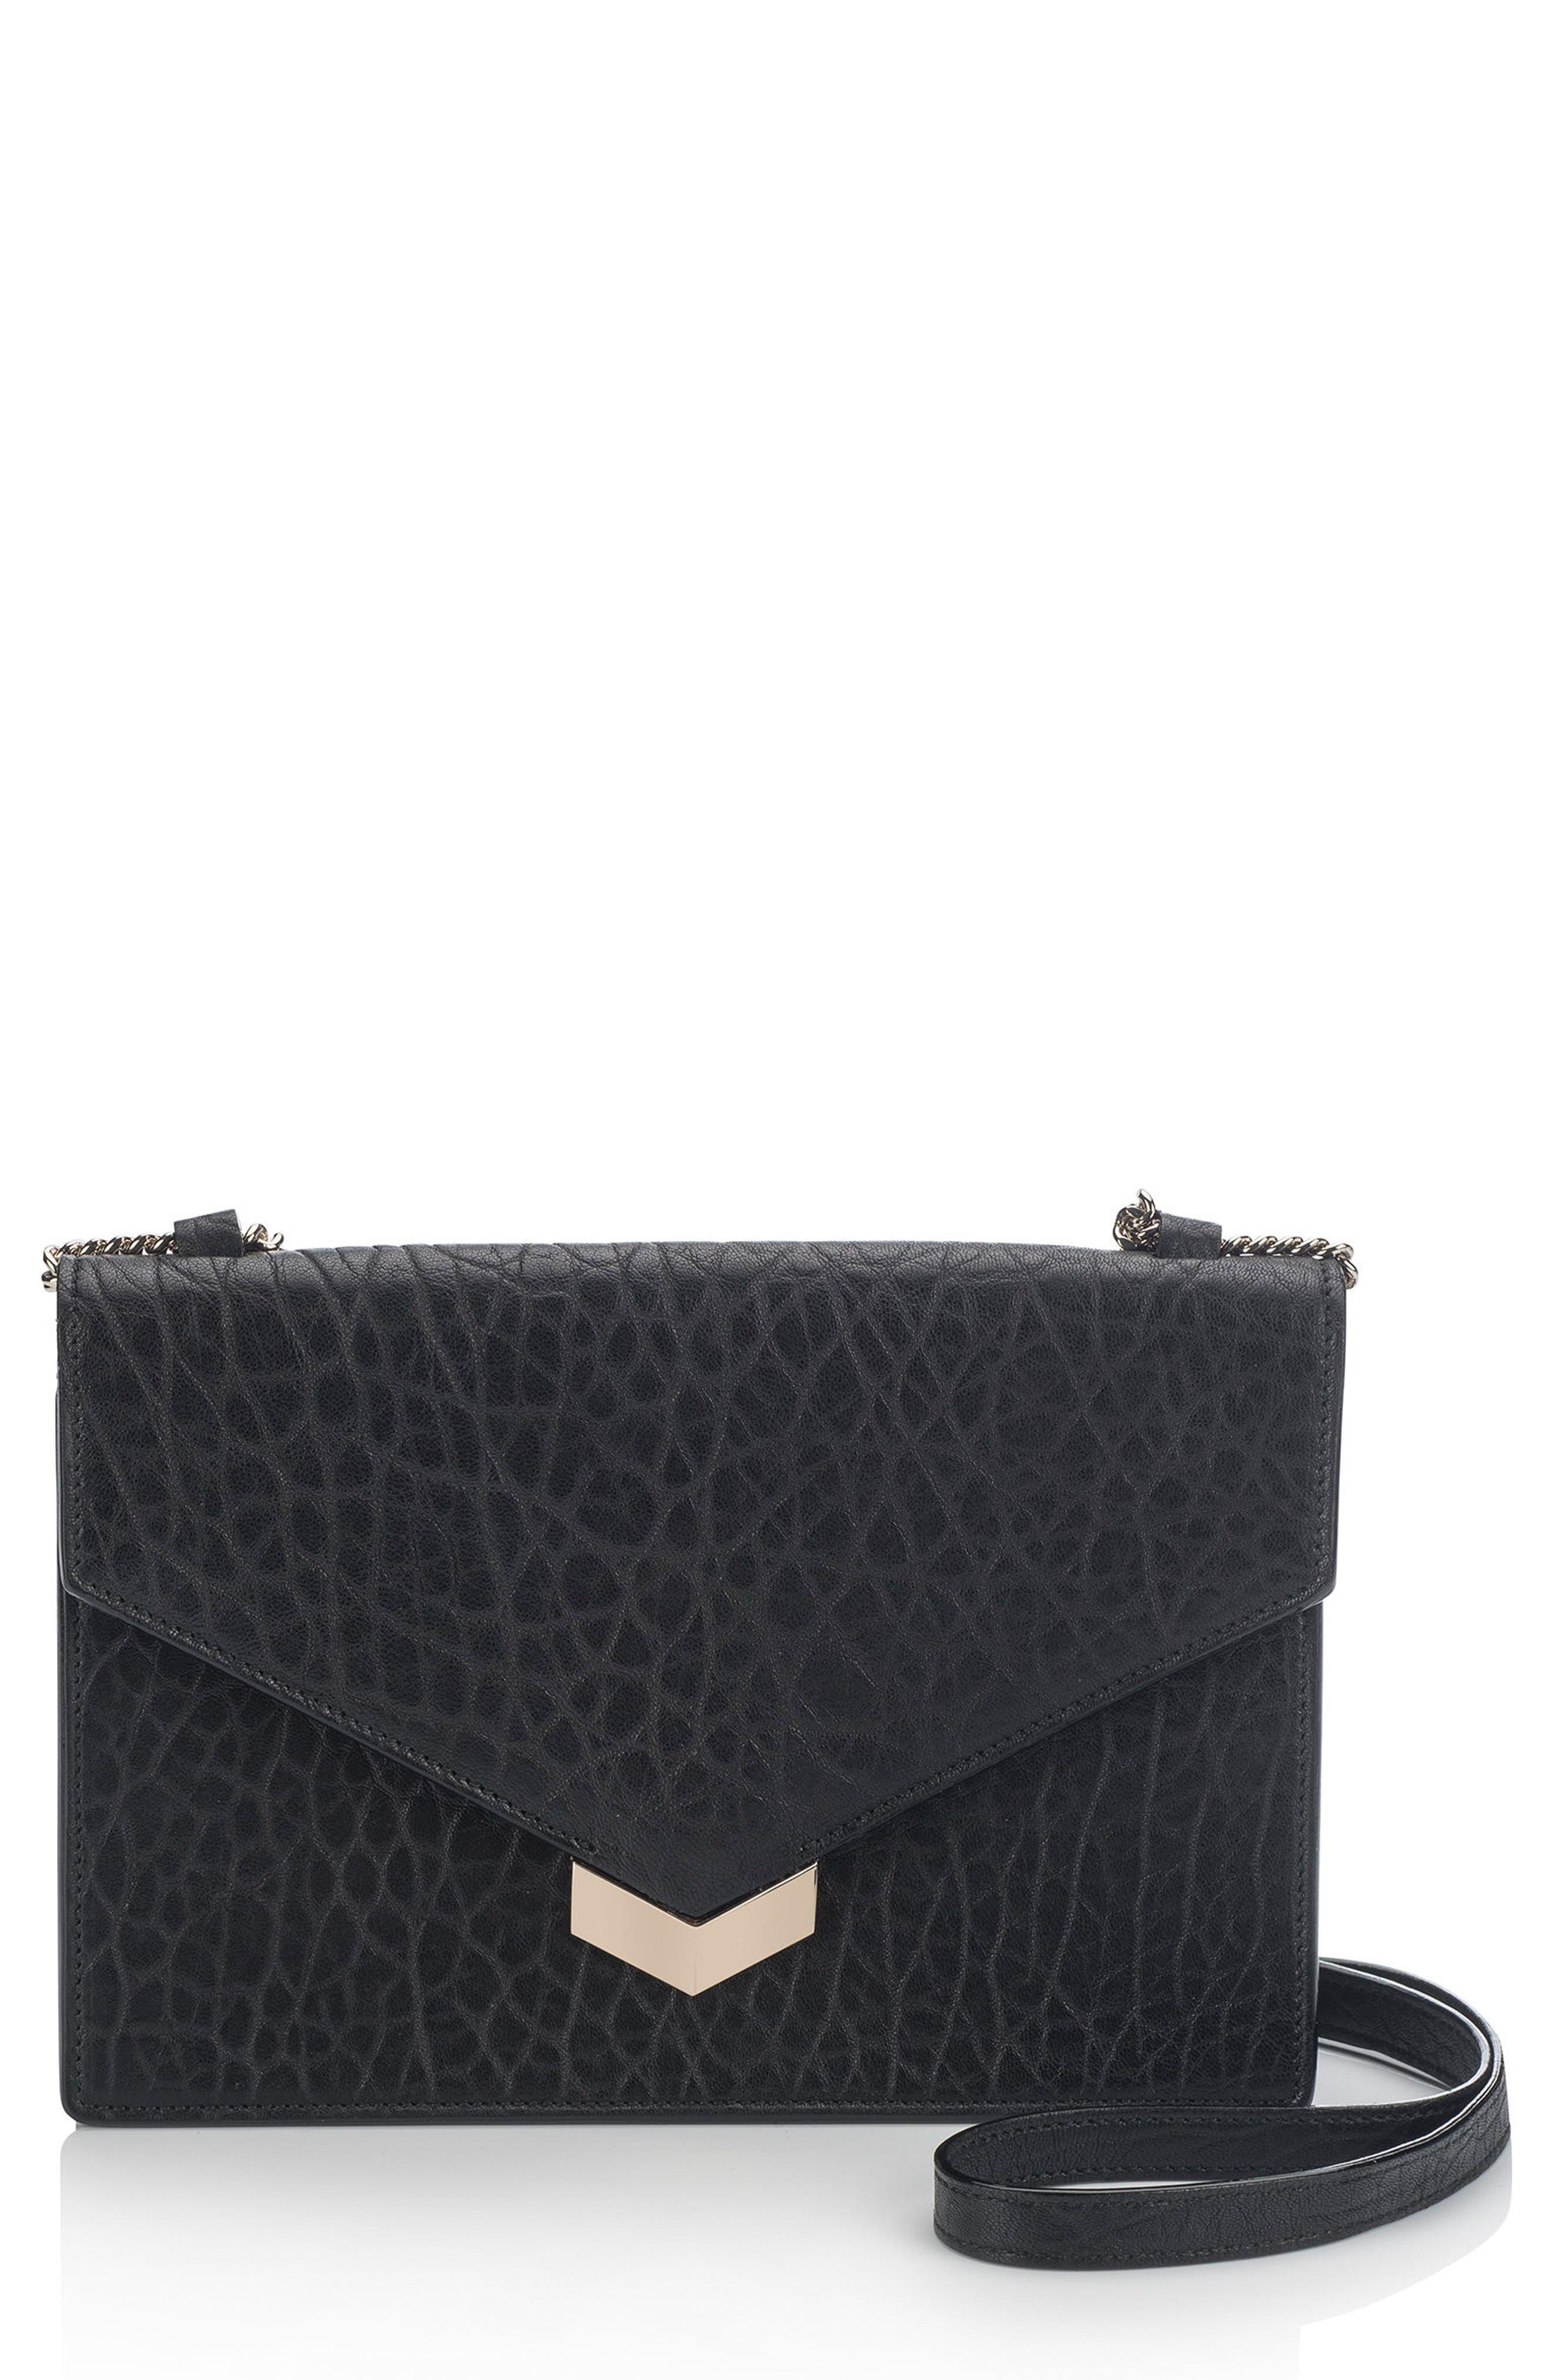 Leila Grainy Lambskin Leather Crossbody Bag,                             Main thumbnail 1, color,                             001